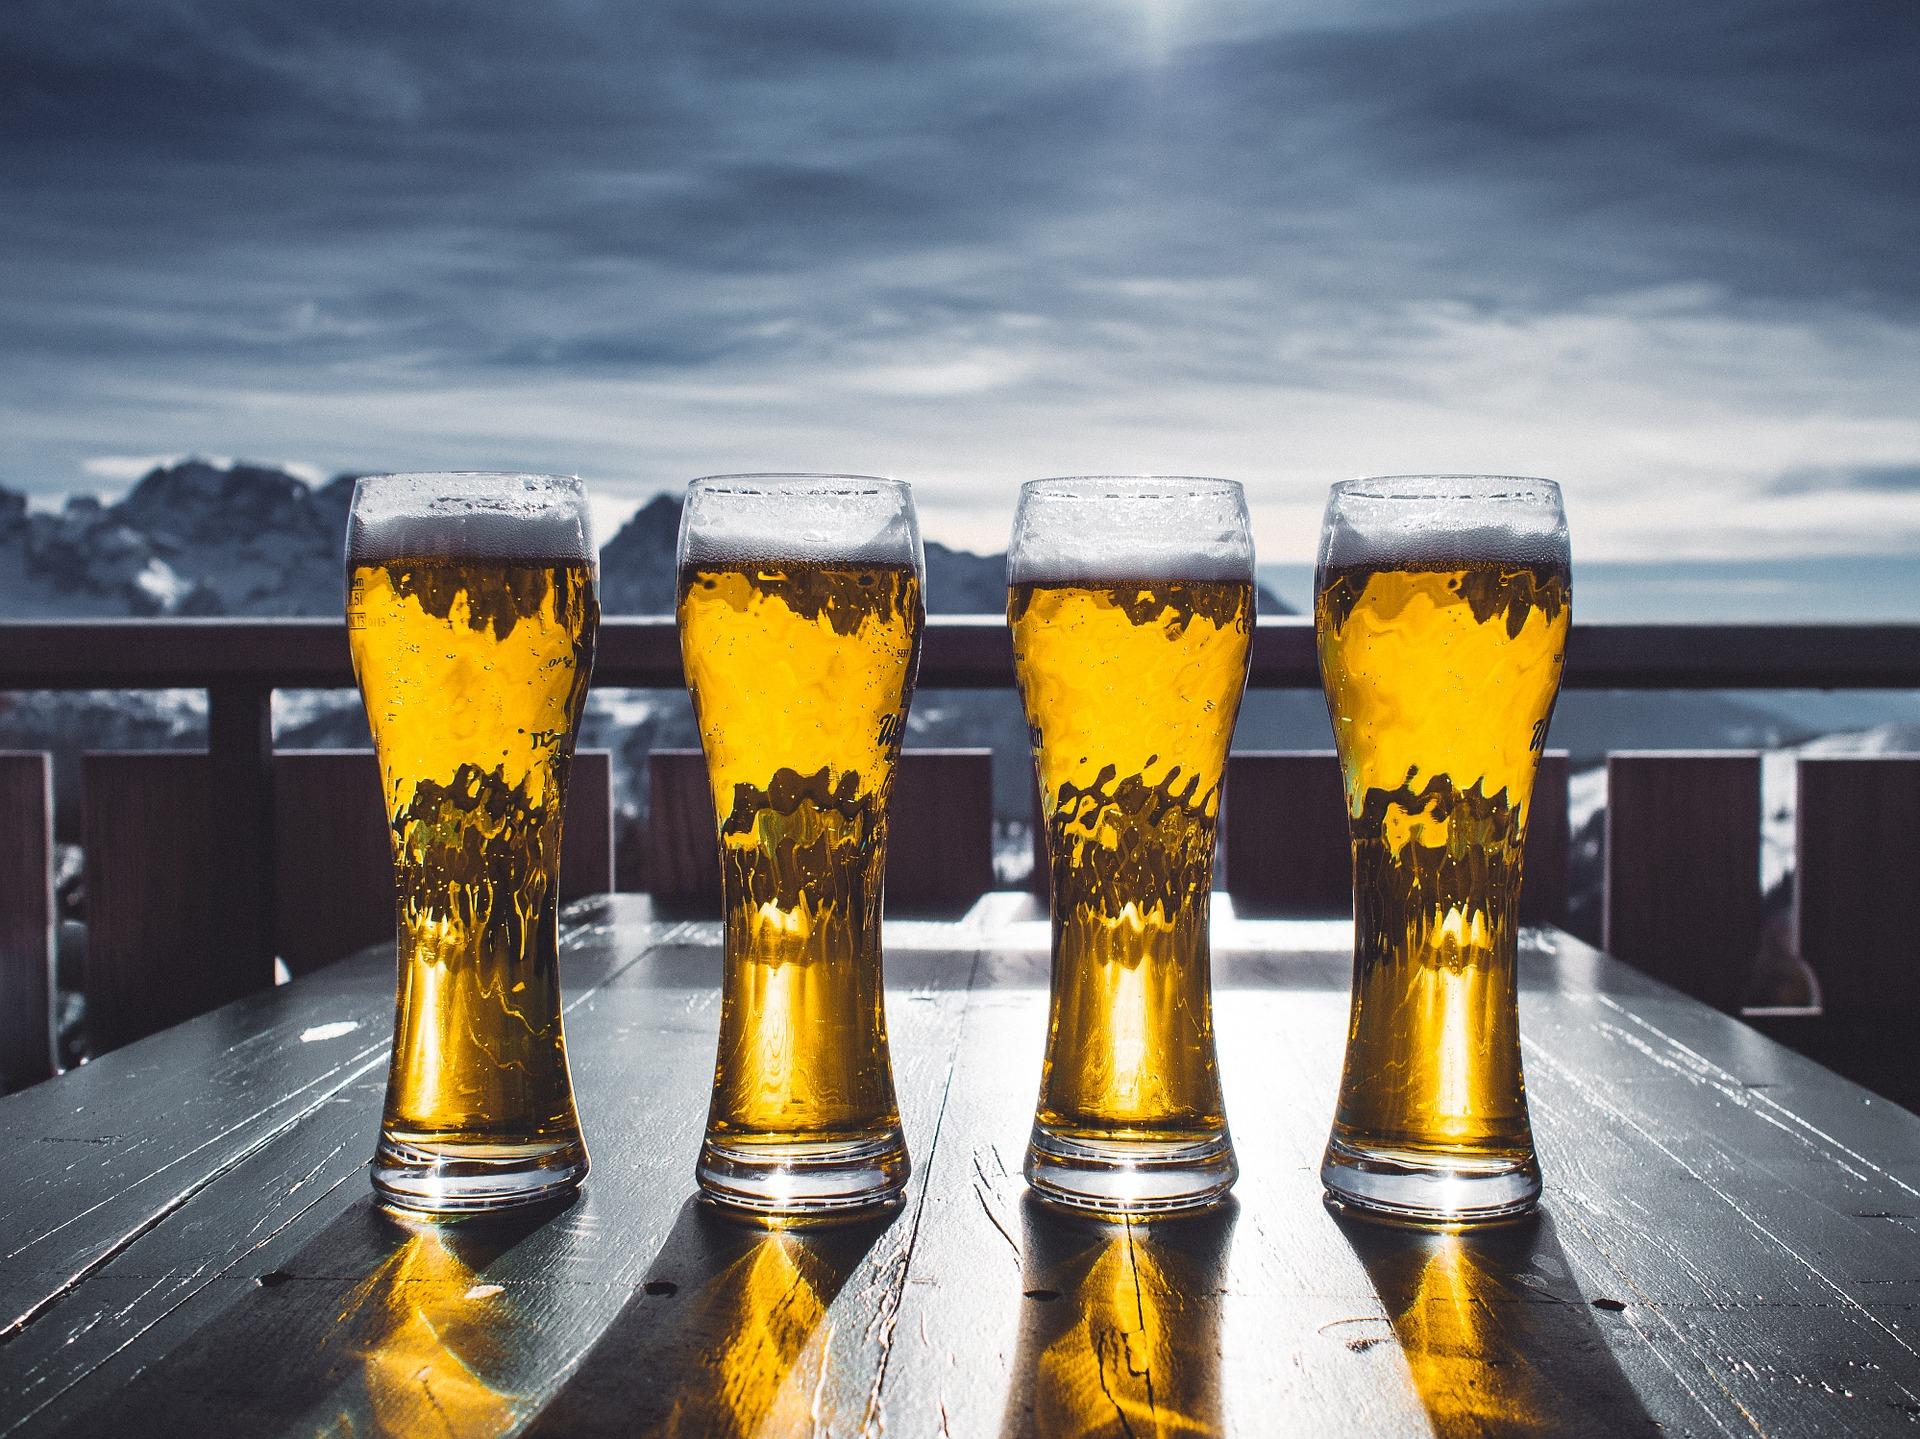 boli de care te apara berea - sfatulparintilor.ro - pixabay_com - beer-932994_1920